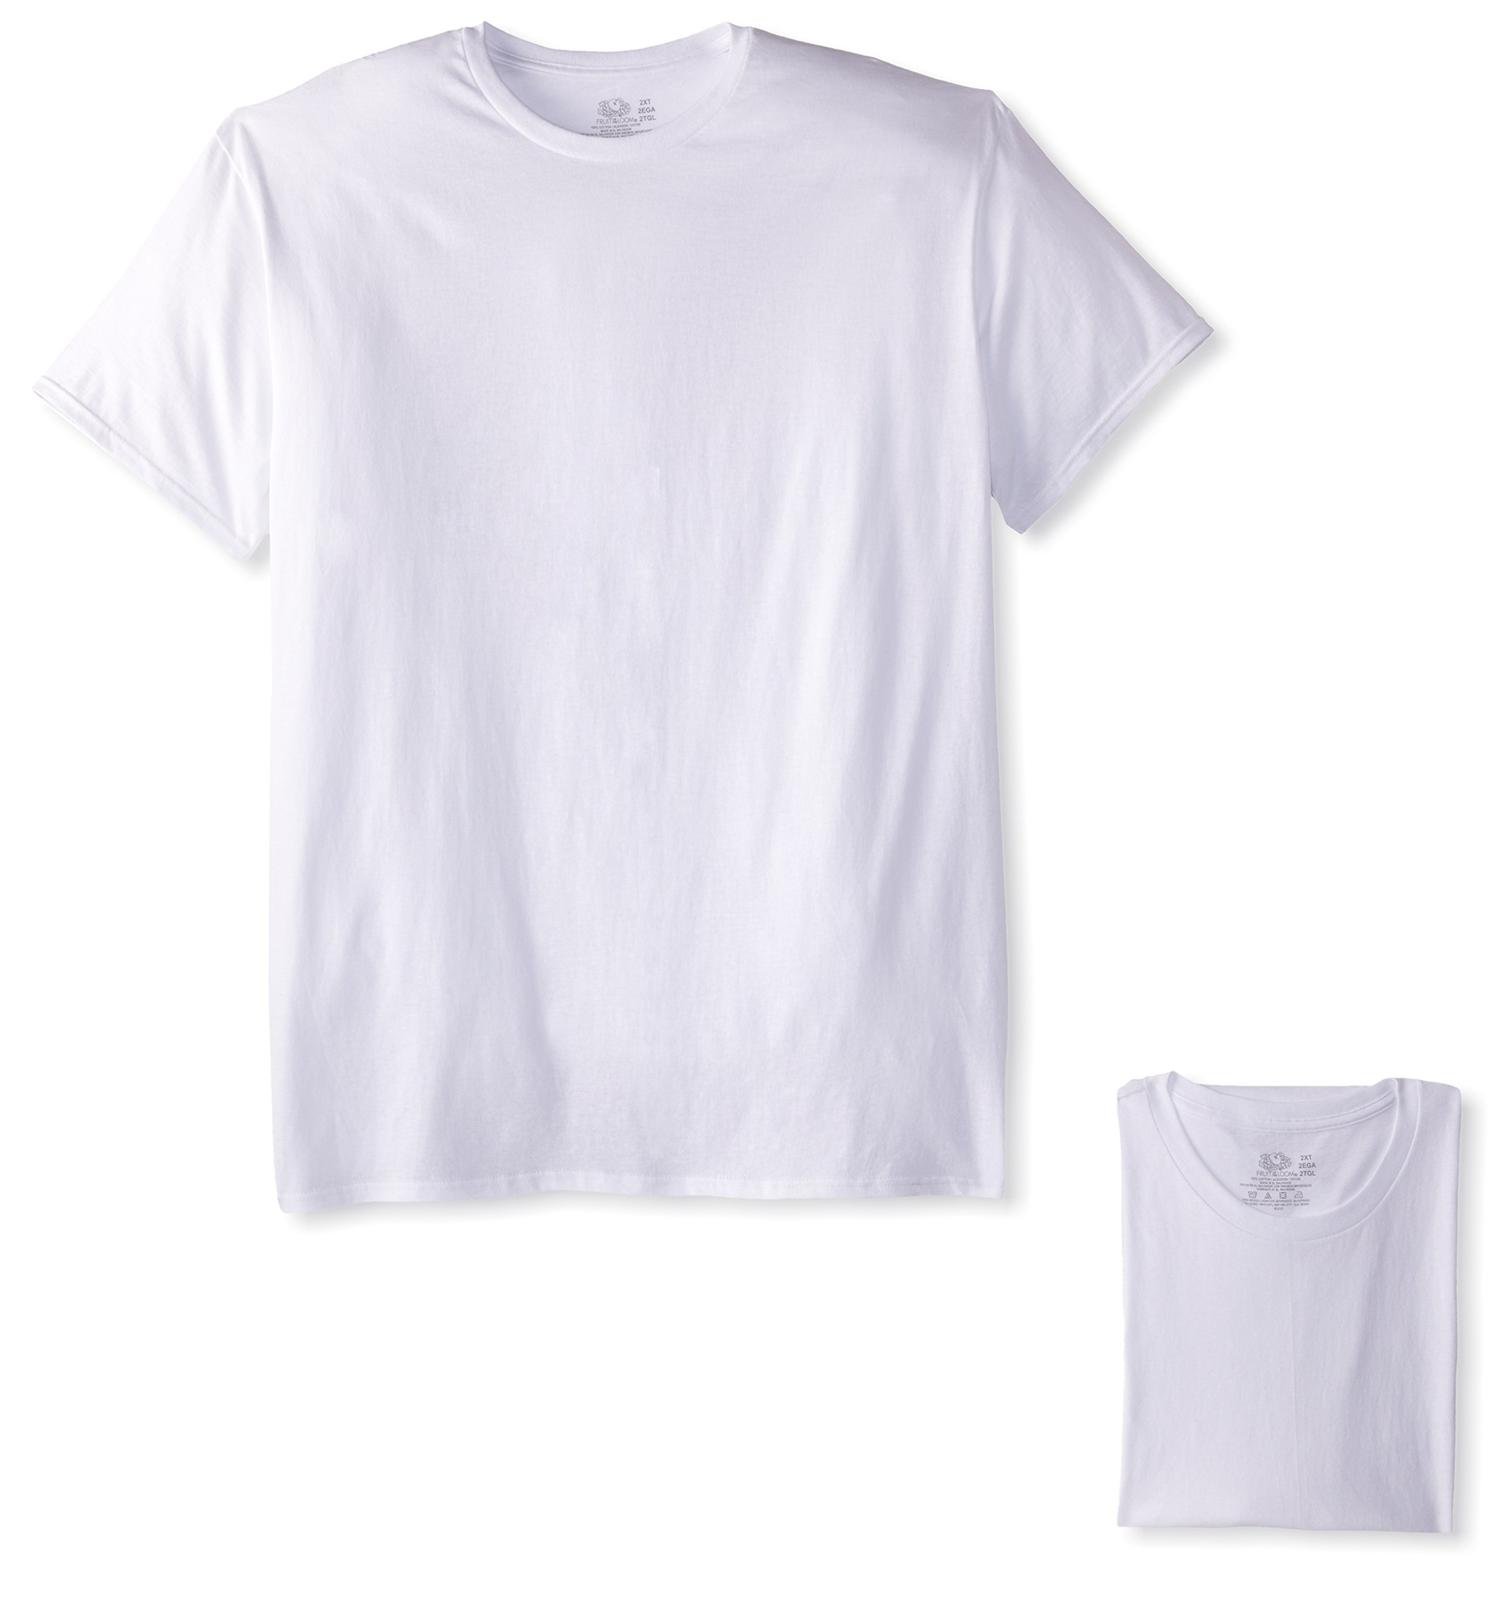 NEW Fruit of the Loom Mens 3 Pack Tall Man Crew Neck T shirt White 2XLT